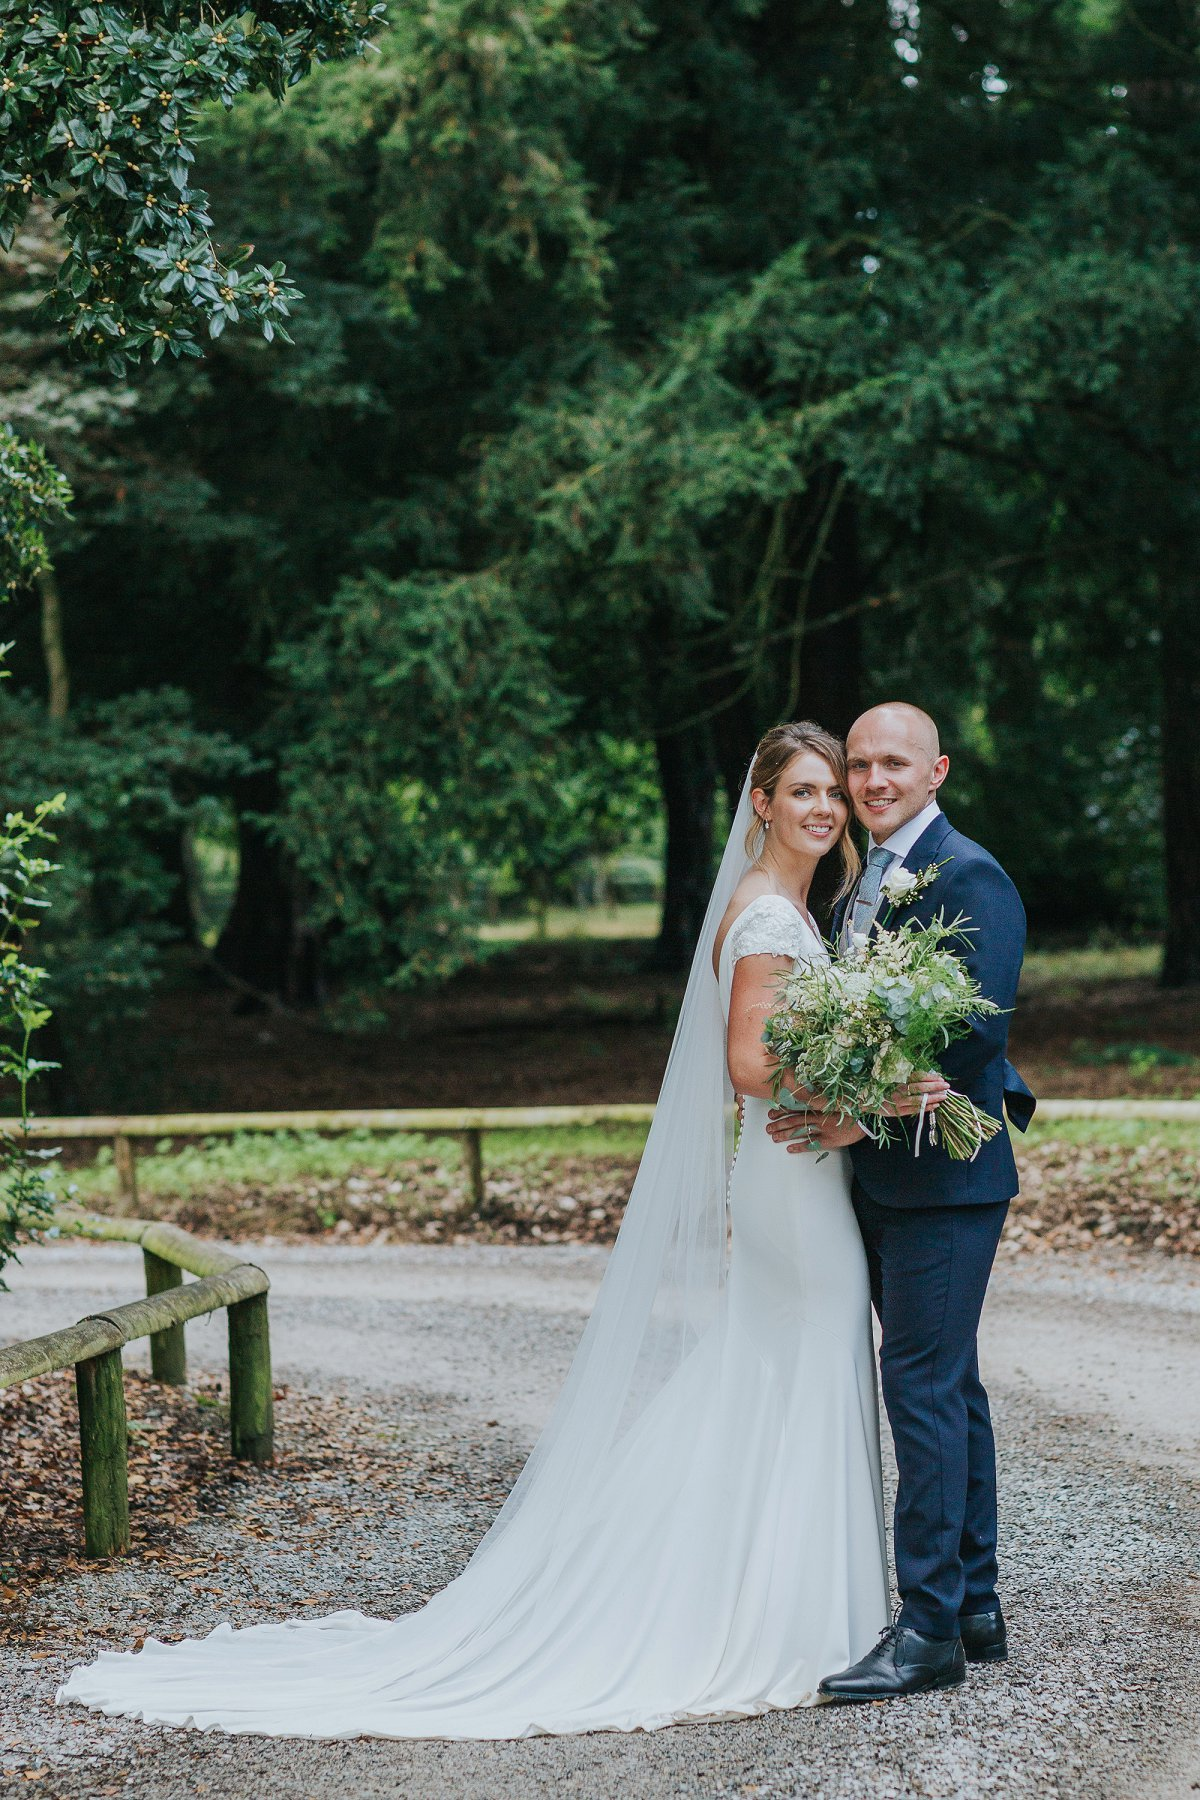 An Elegant Wedding at Middleton Lodge (c) Laura Calderwood Photography (53)